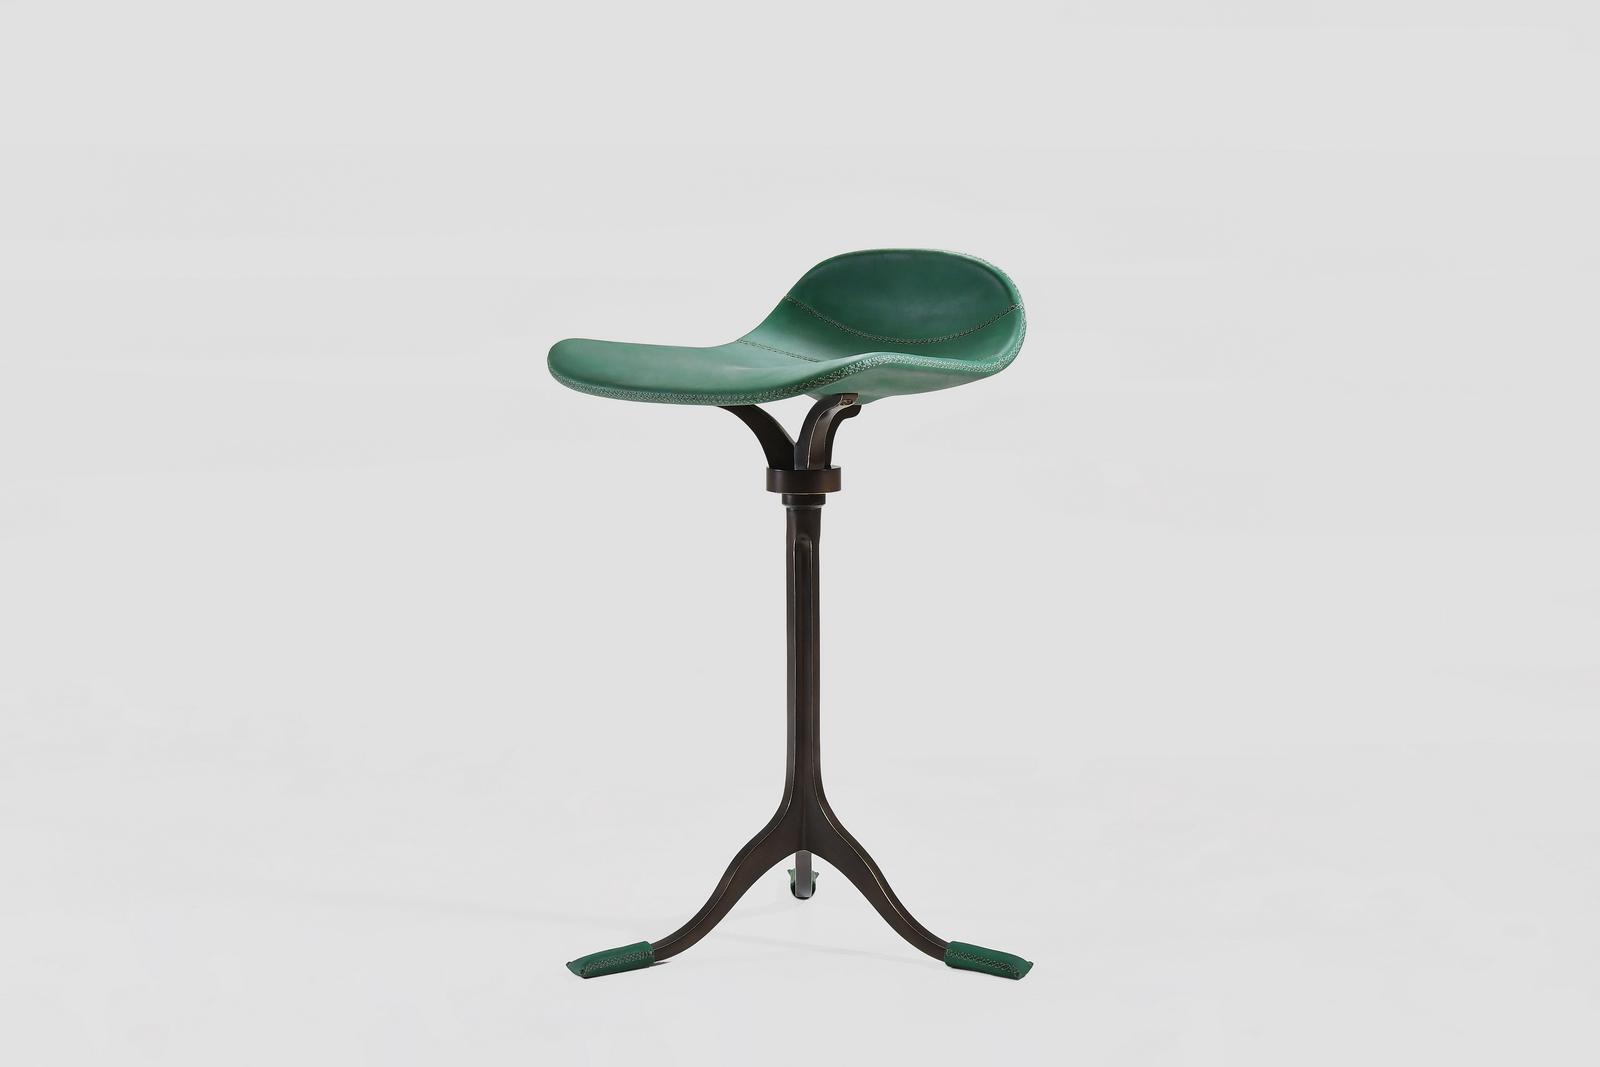 PTendercool-Chair-PT48-BS3-GR-05